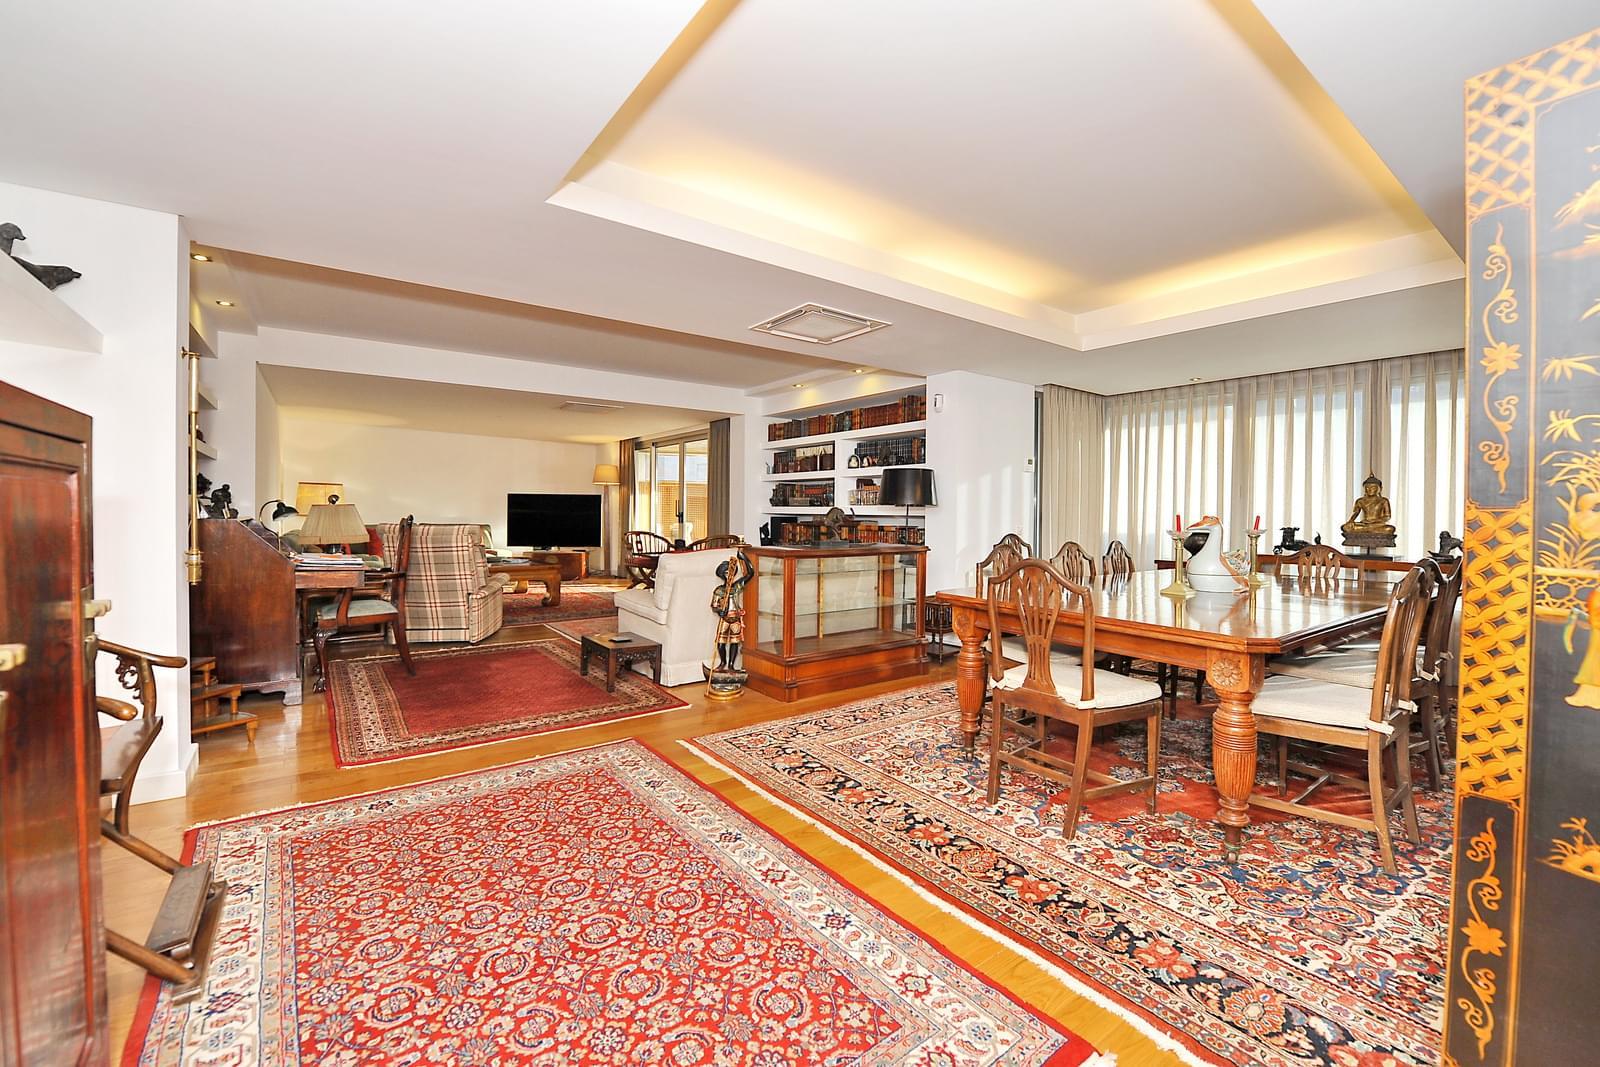 pf18957-apartamento-t5-oeiras-f5f8cc22-d151-405f-999e-bec1eb310d2c